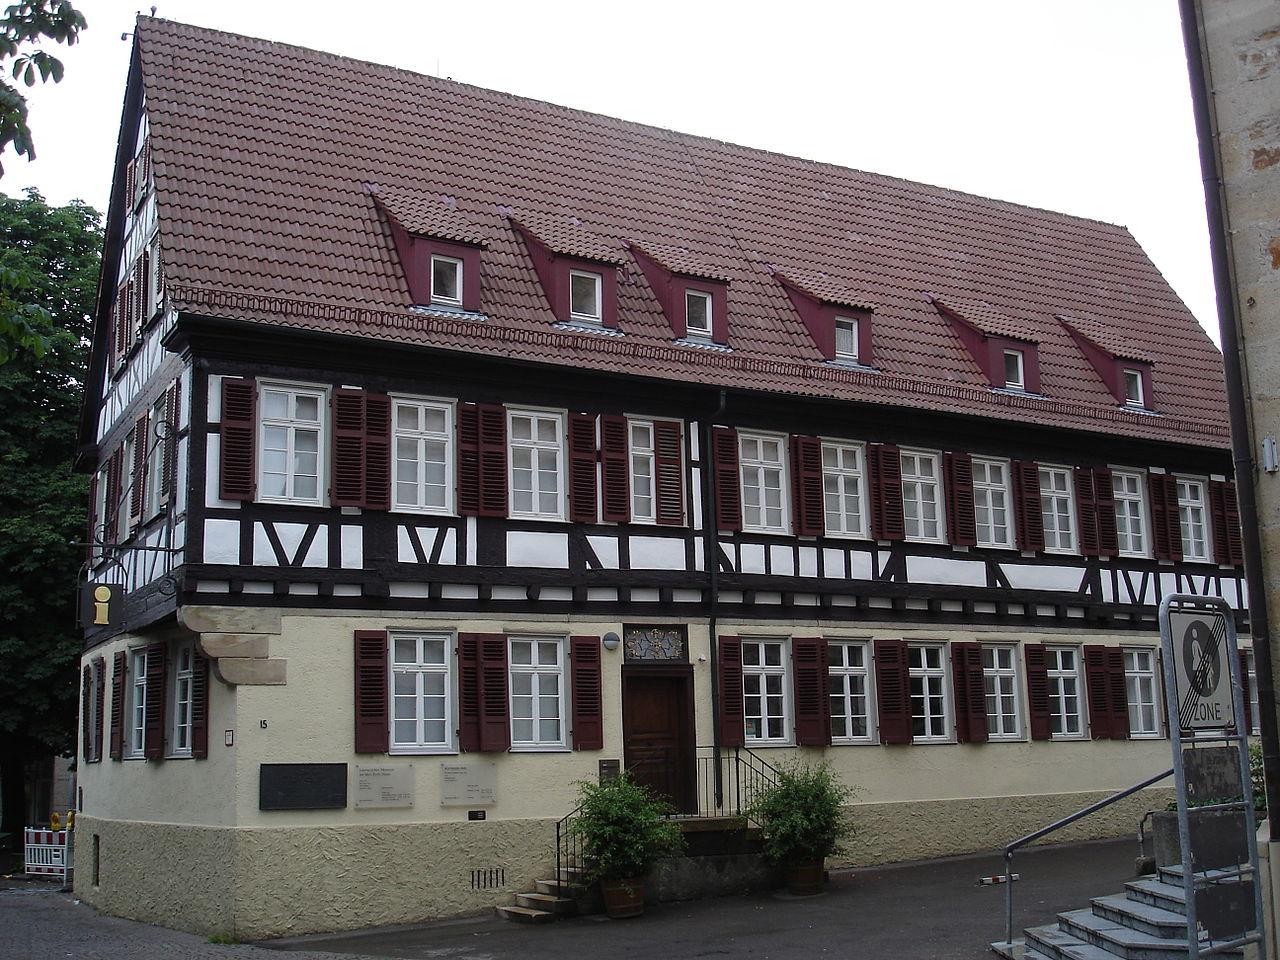 Bild Max Eyth Haus Kirchheim an der Teck